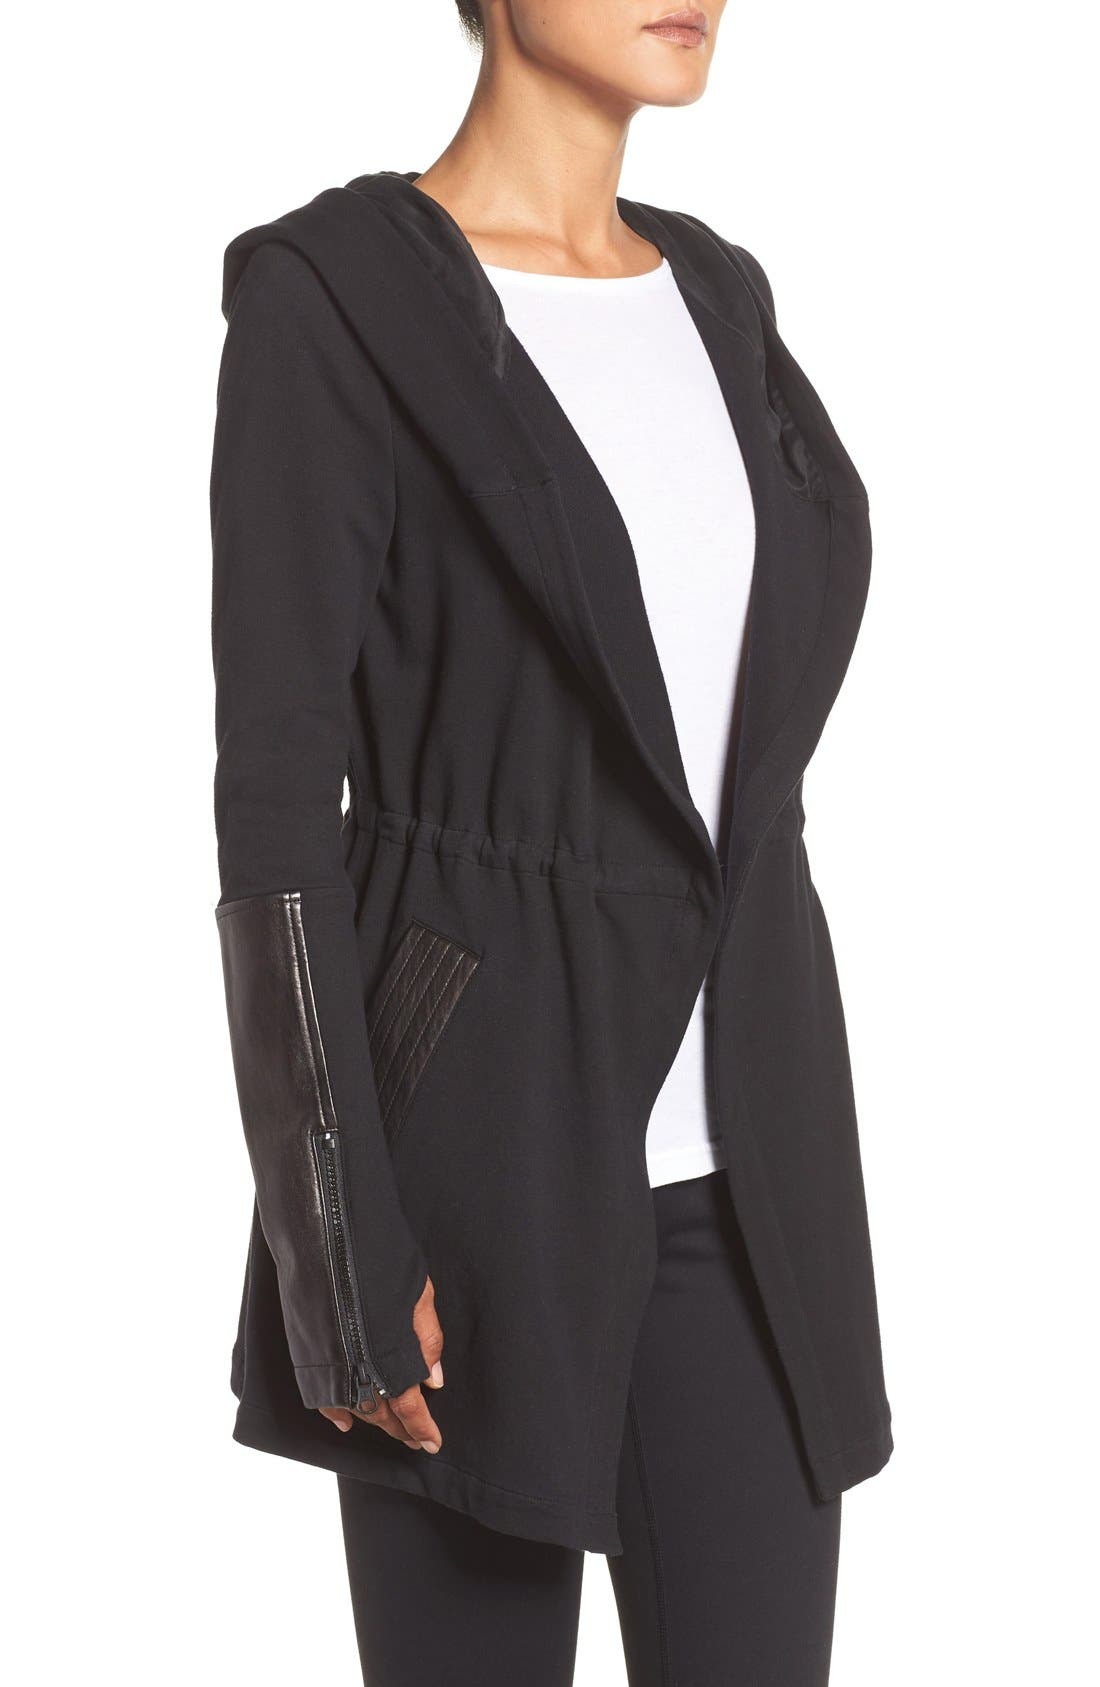 Traveler Wrap Jacket,                             Alternate thumbnail 9, color,                             BLACK/ BLACK